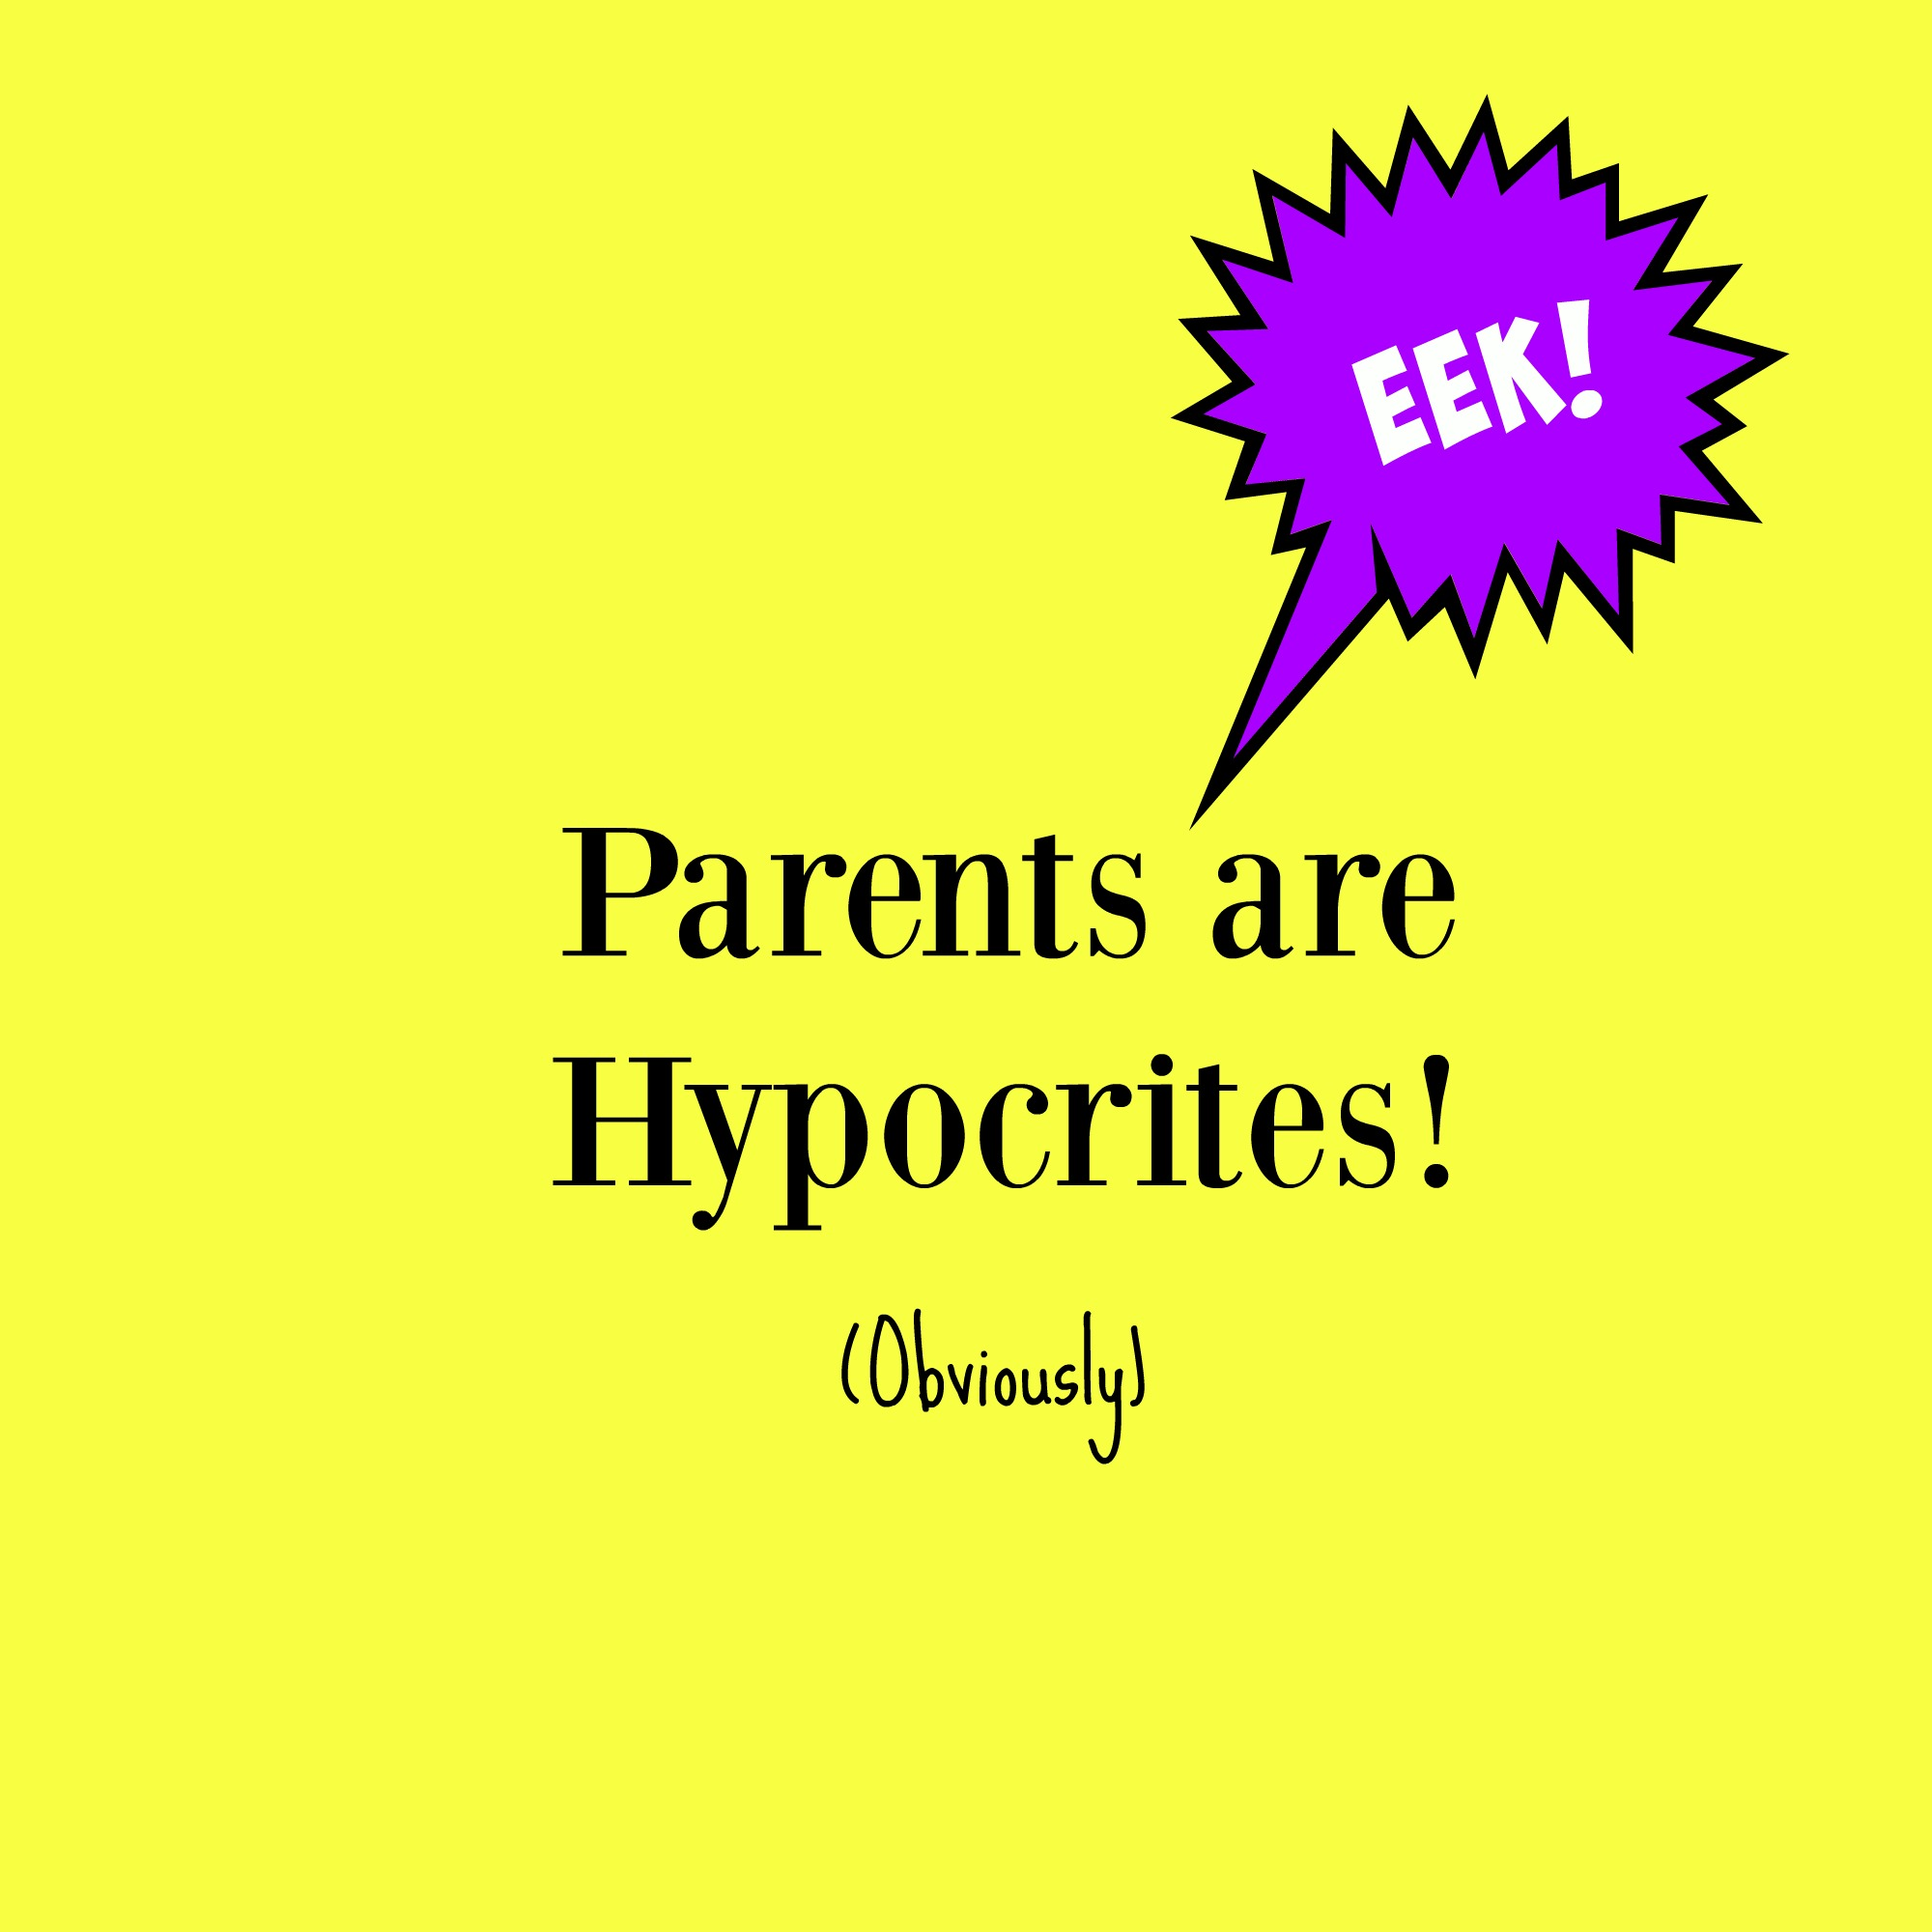 hypocrites essay · creative title for an essay on hypocrisy vs society essay on hypocrisy source(s): oscar wilde versus the hypocrites.